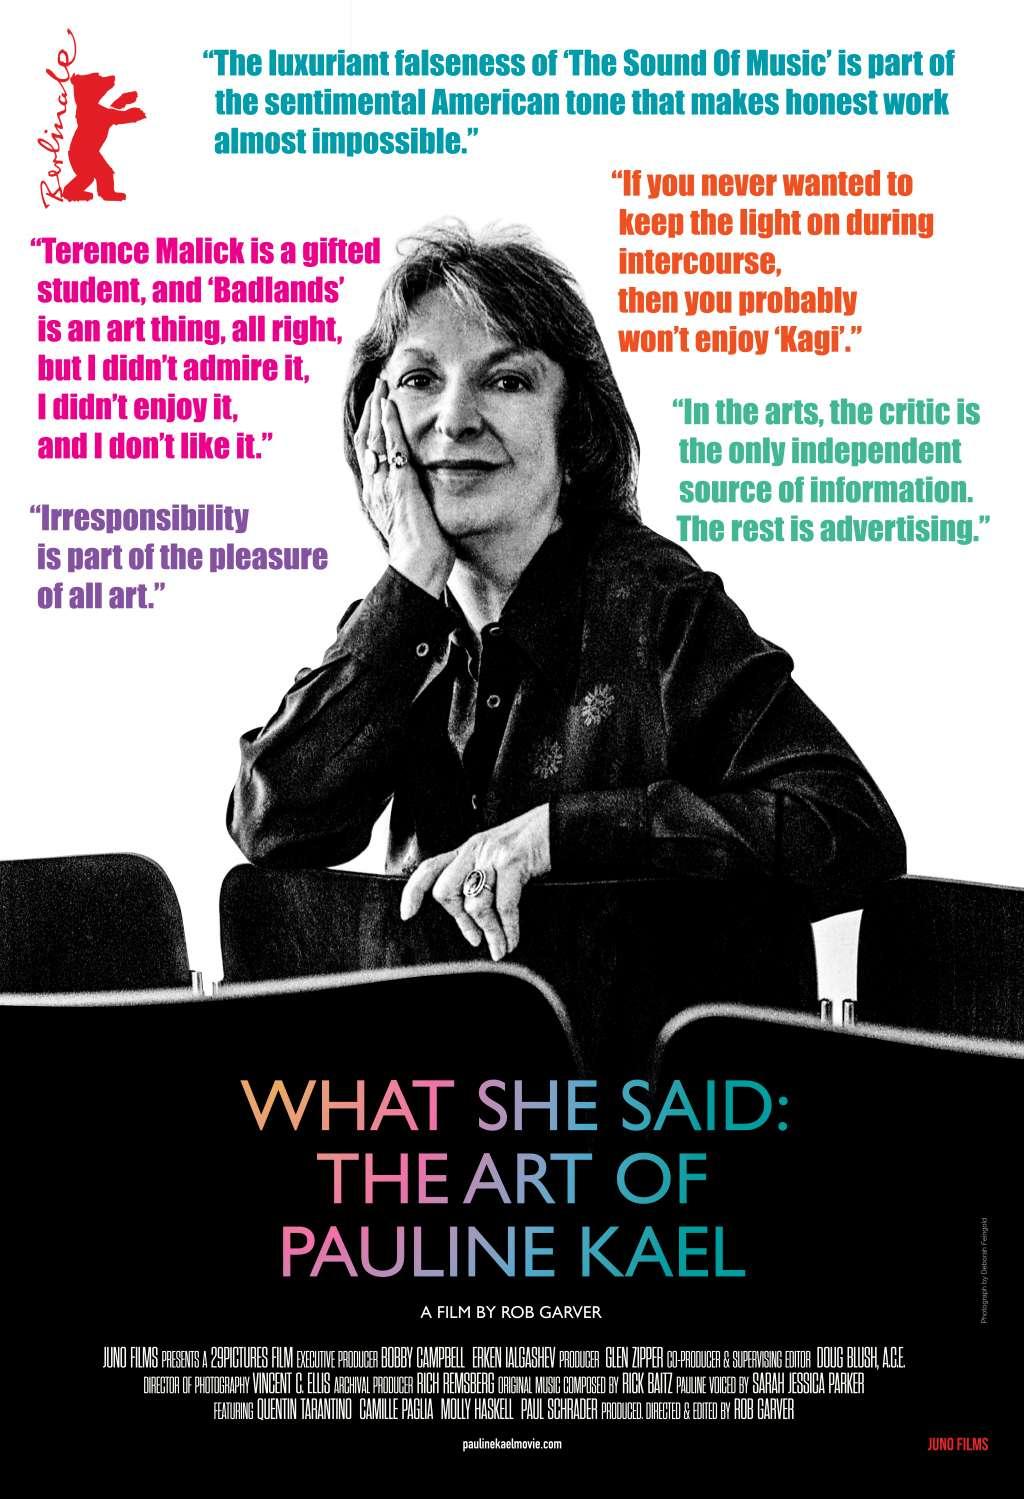 What She Said: The Art of Pauline Kael kapak